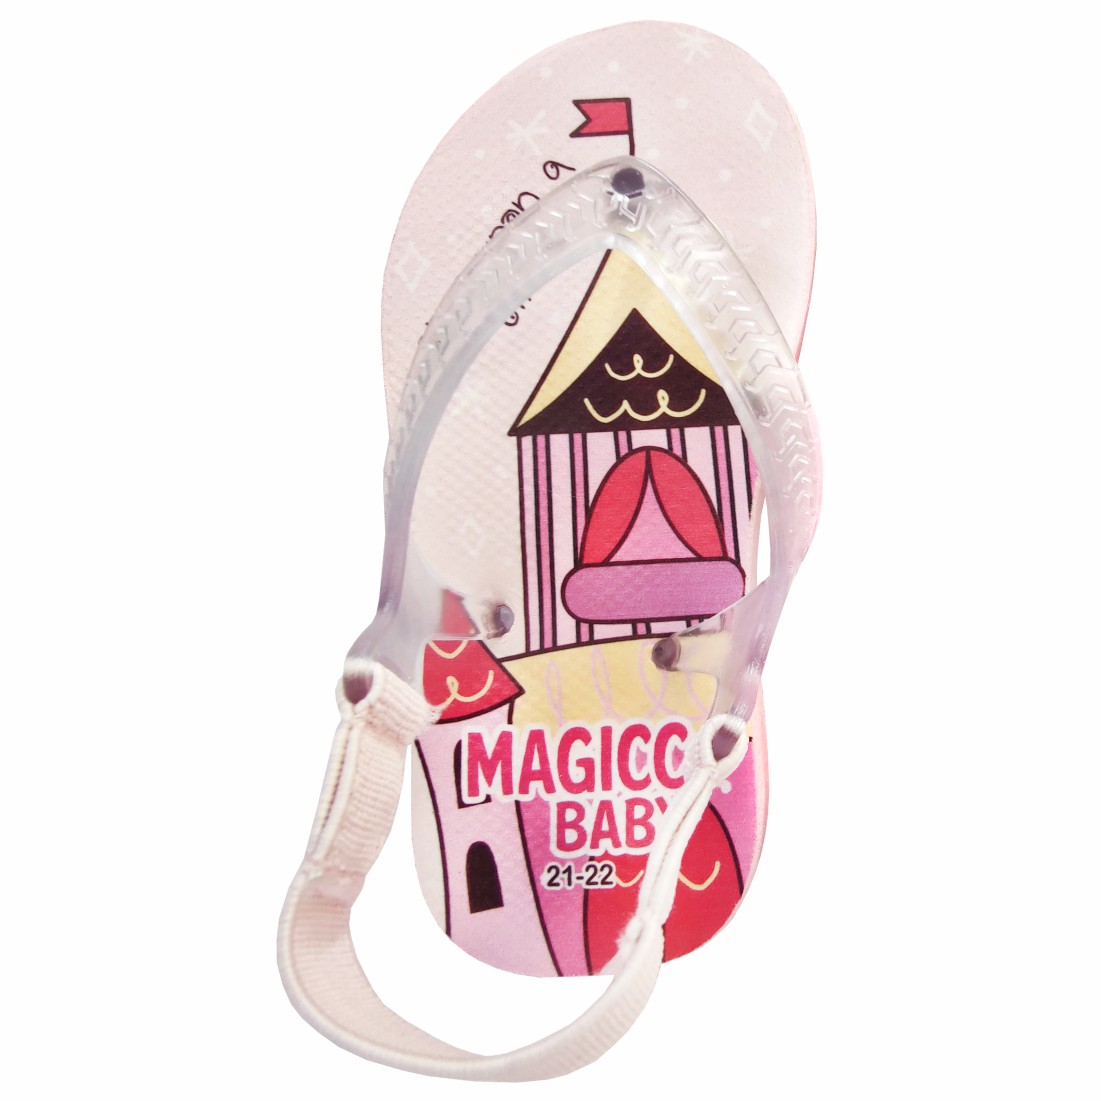 Chinelo Bebê Sandália Infantil Princesa Meninas Magicc Baby